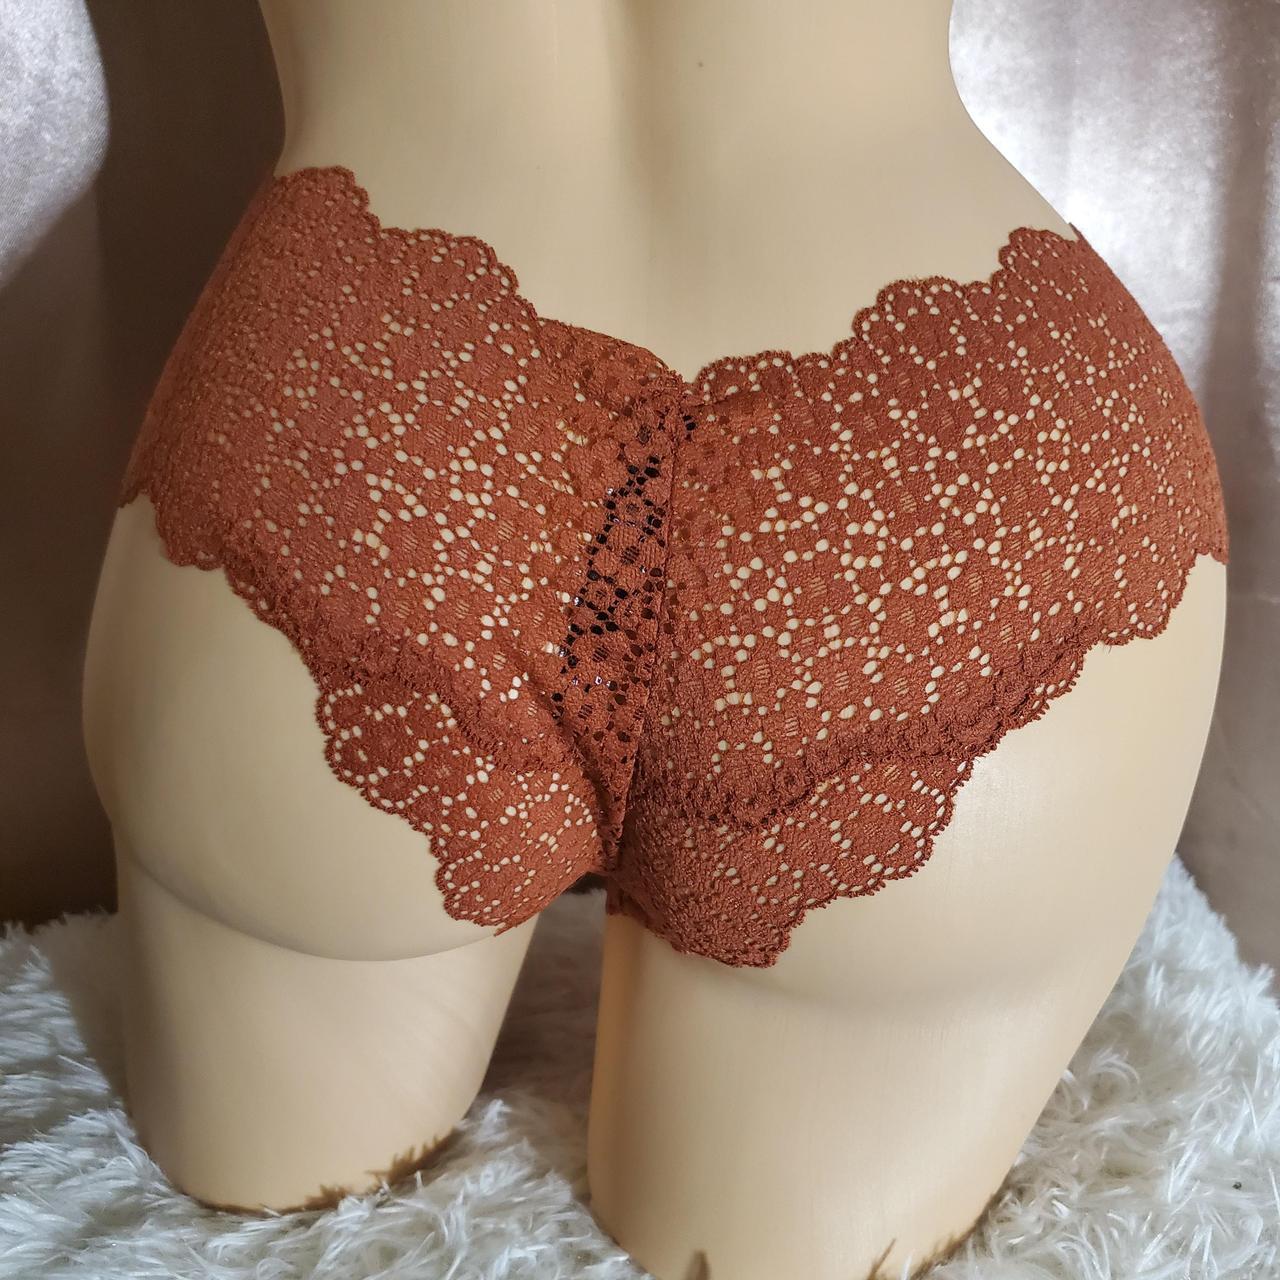 Product Image 1 - Victoria secret lace panty    Brand